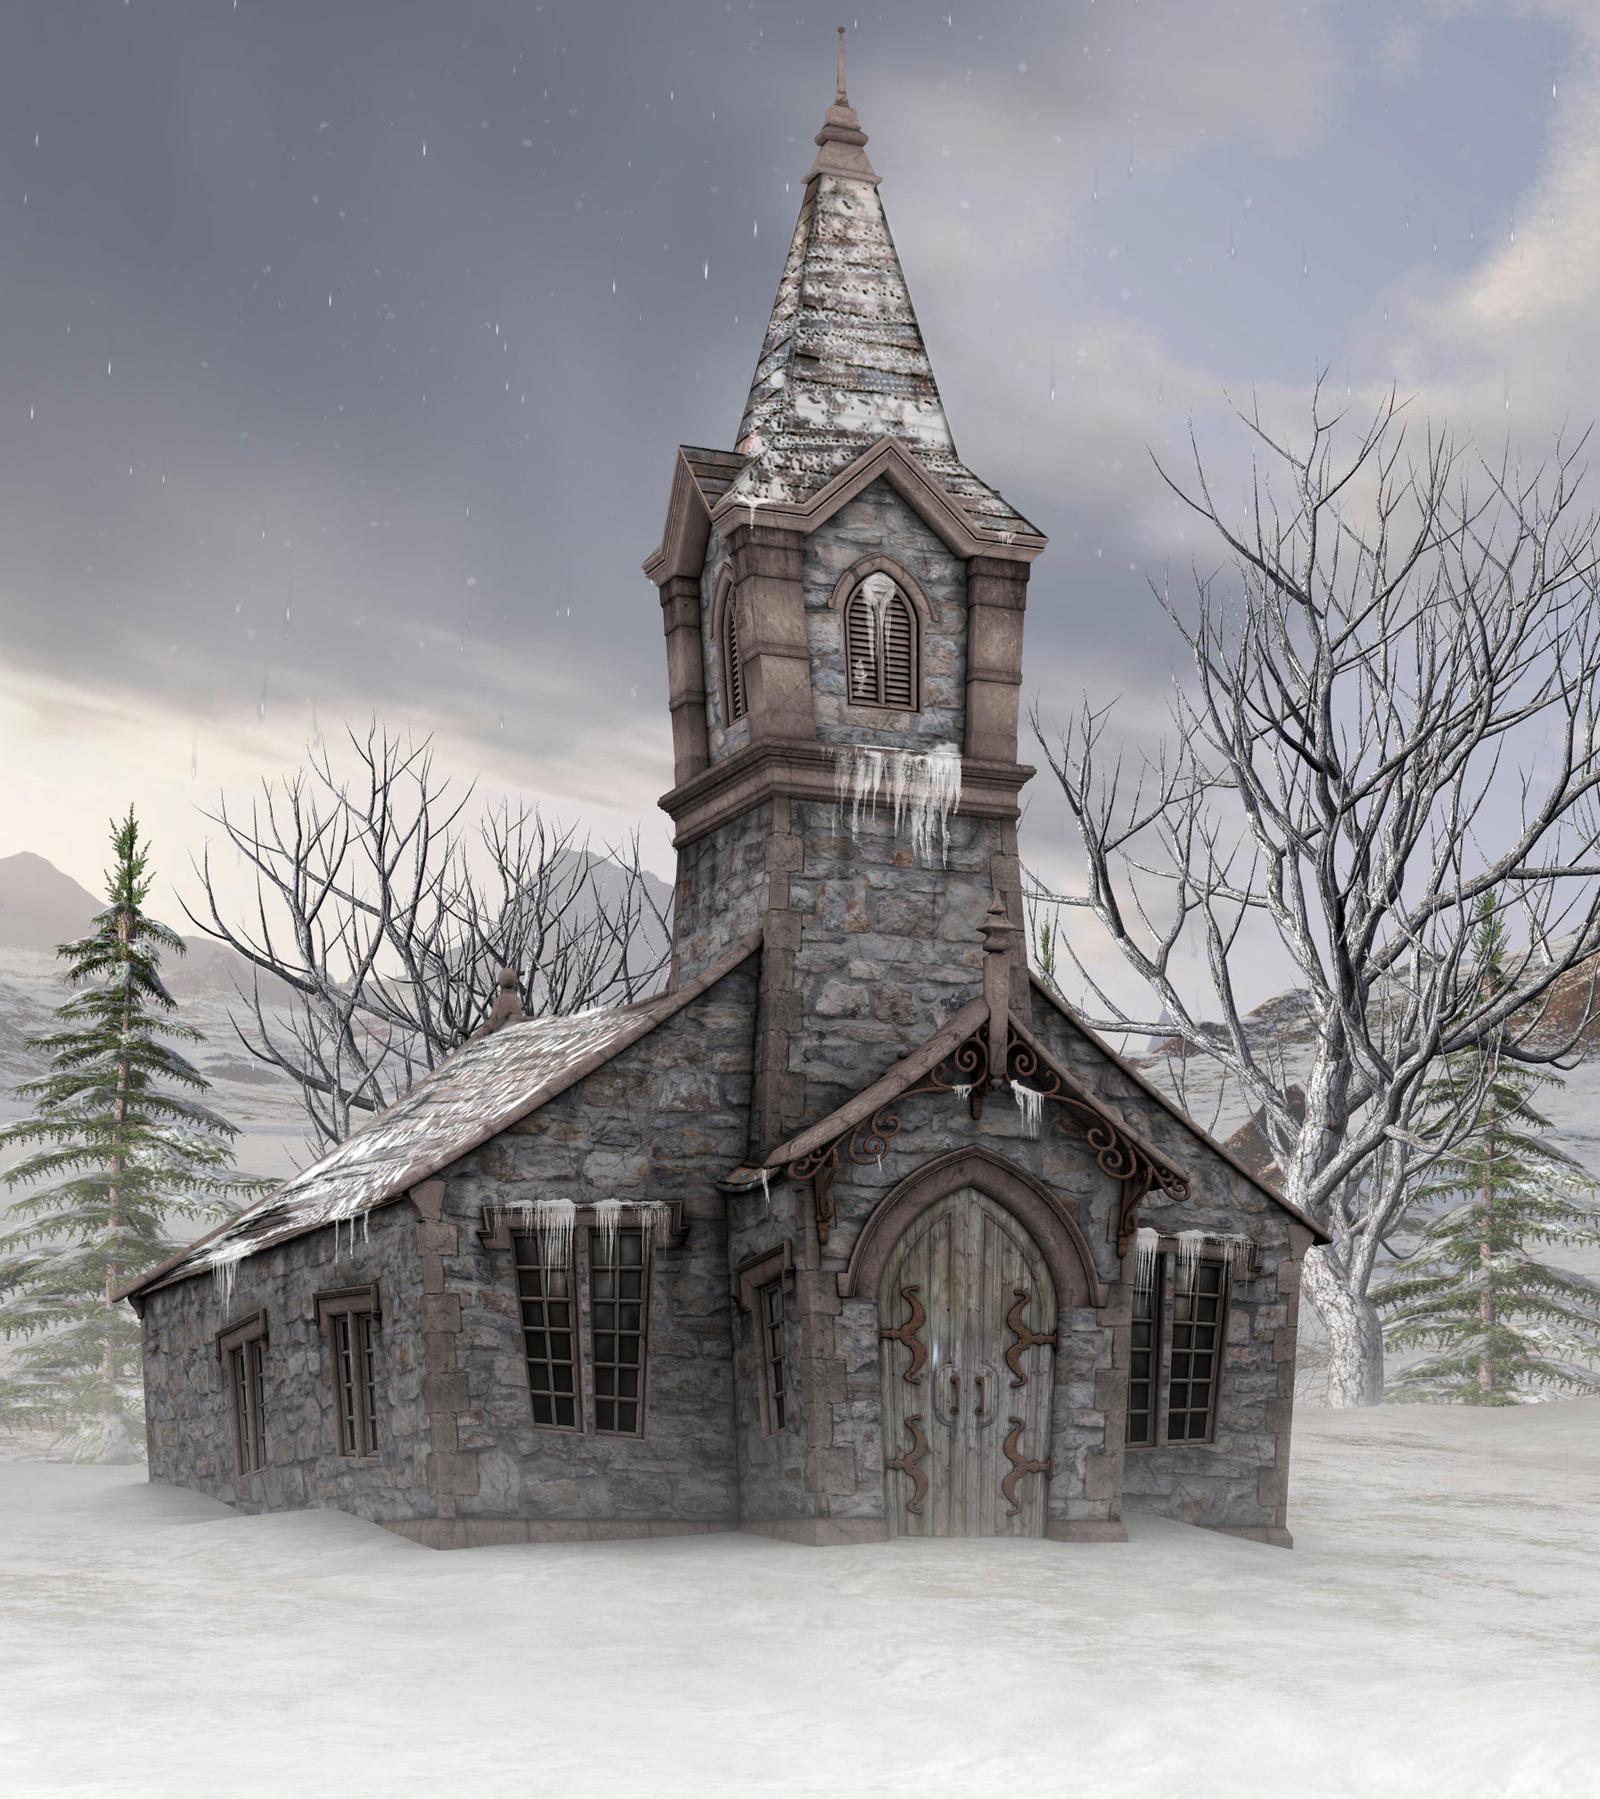 Winter school background by indigodeep